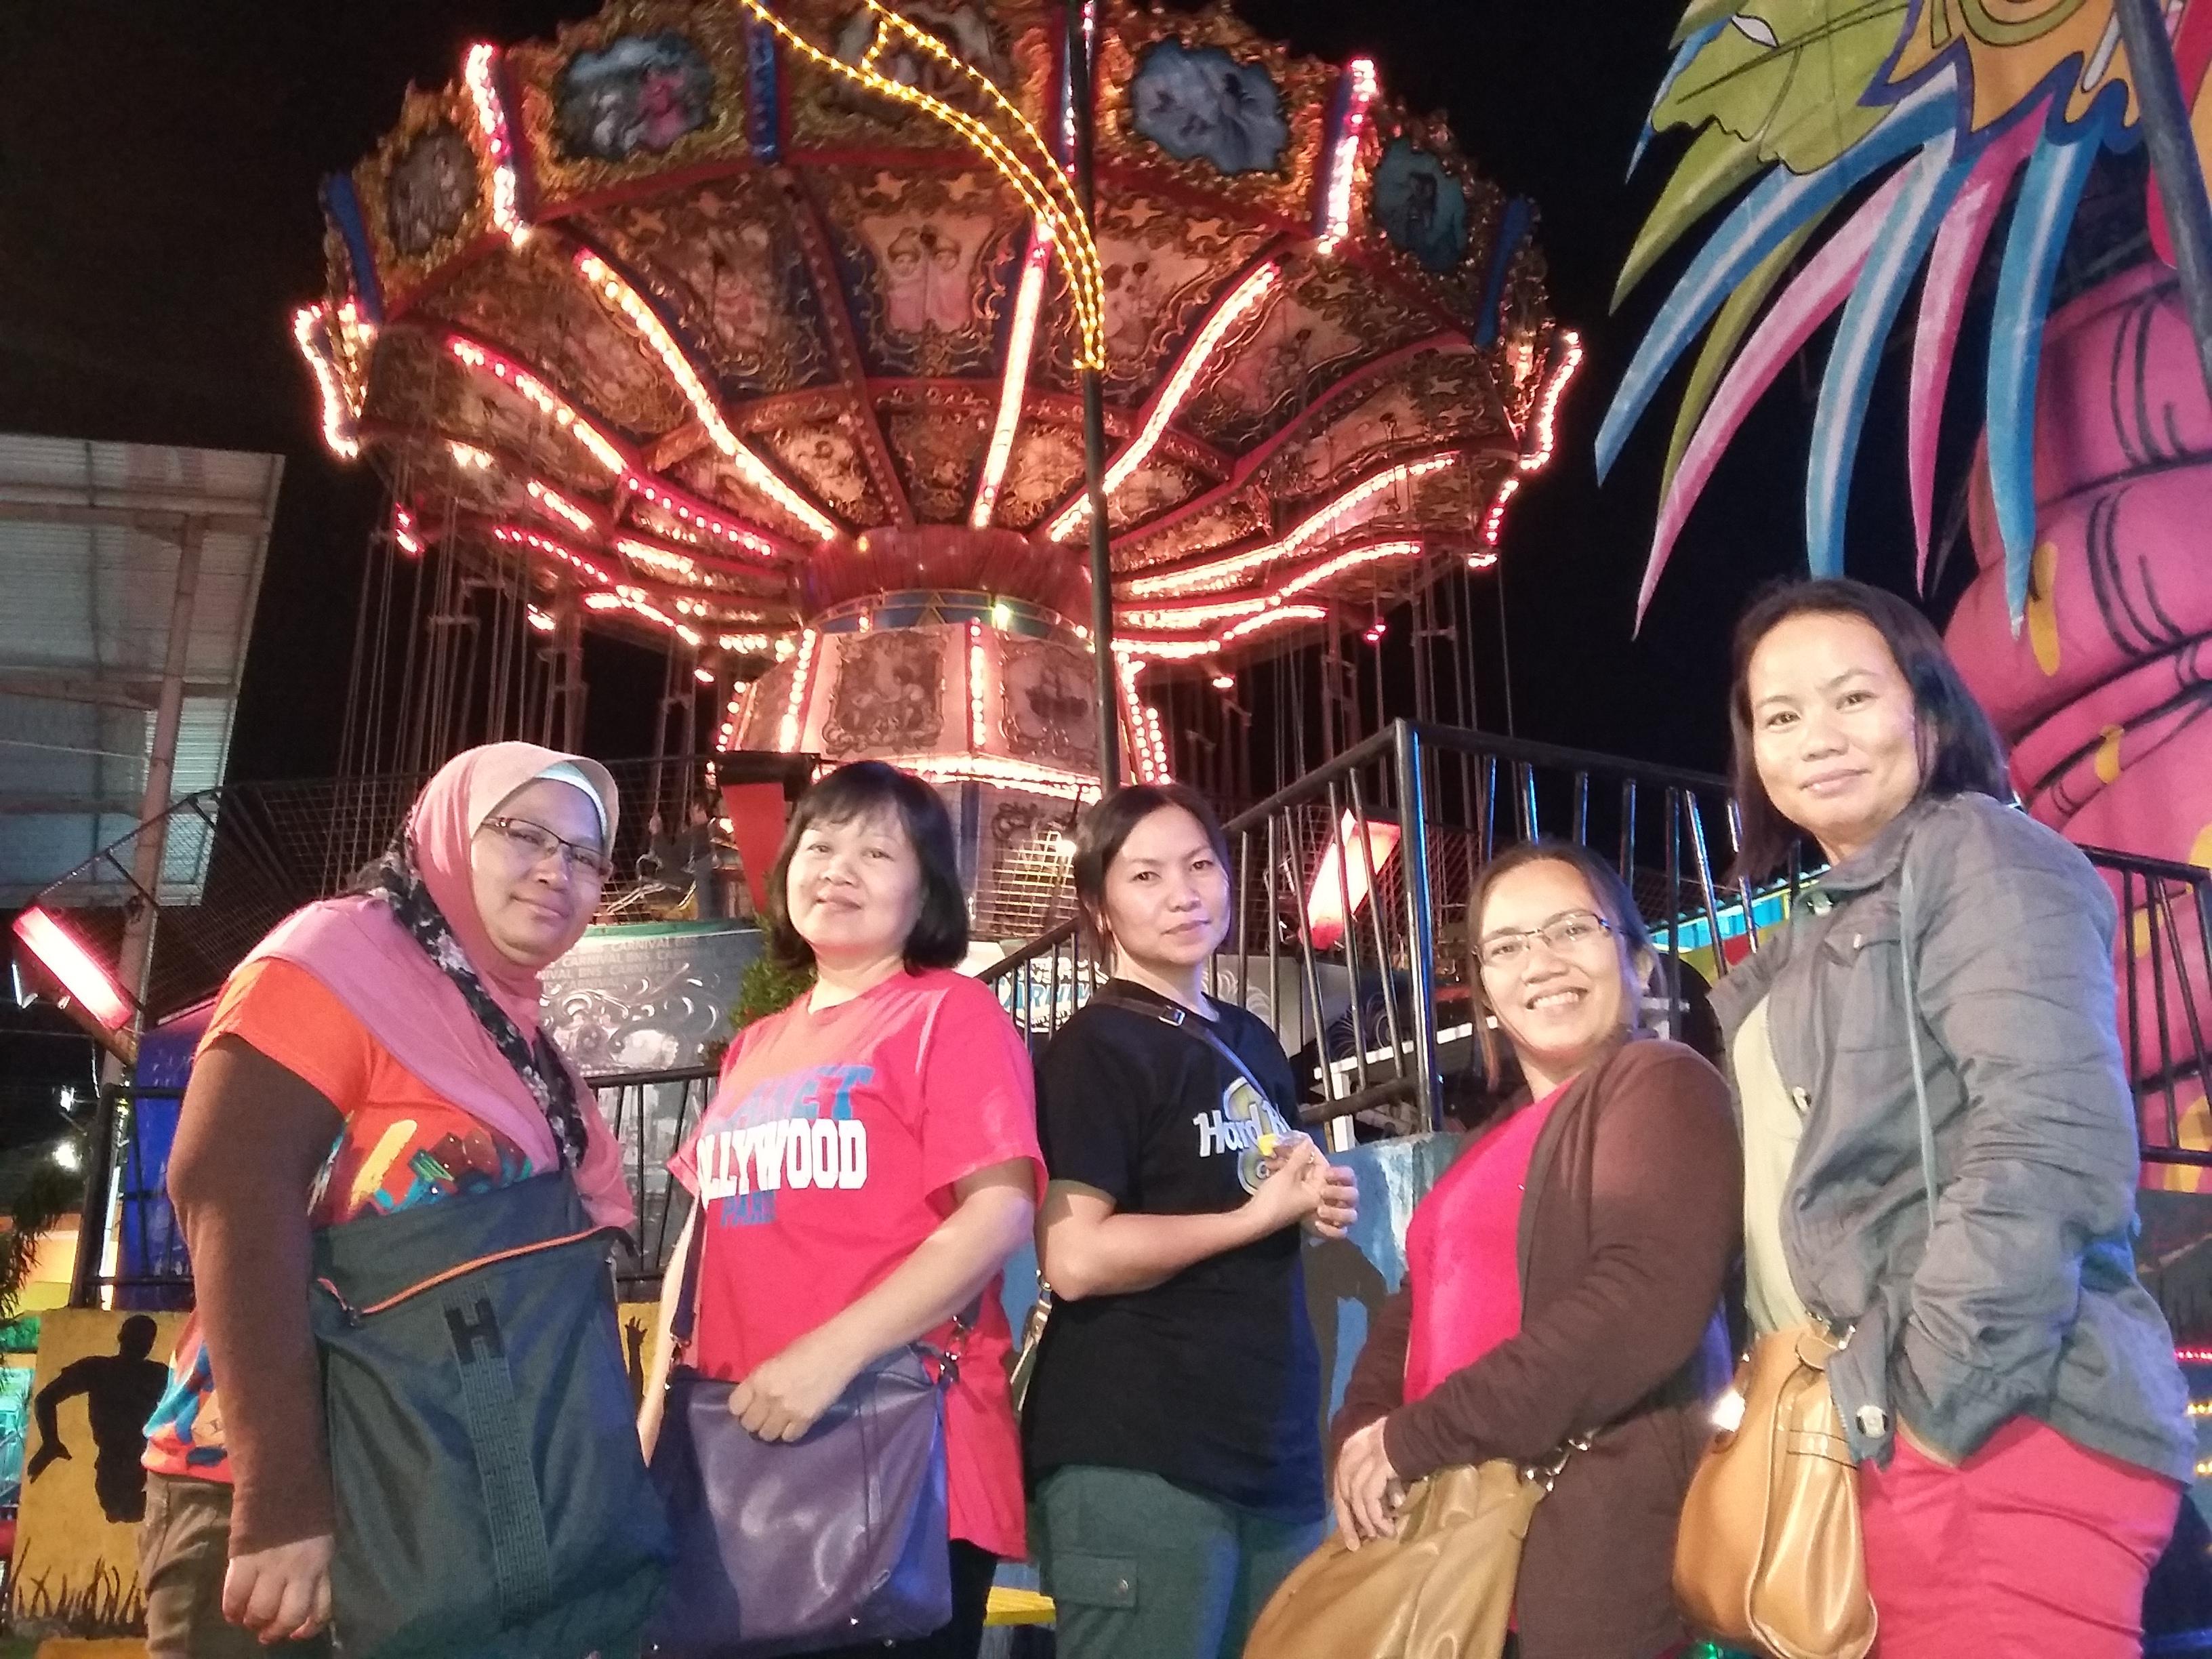 Wisata Bns Malang Batu Night Spectacular Jawa Timur Bromo Jatim